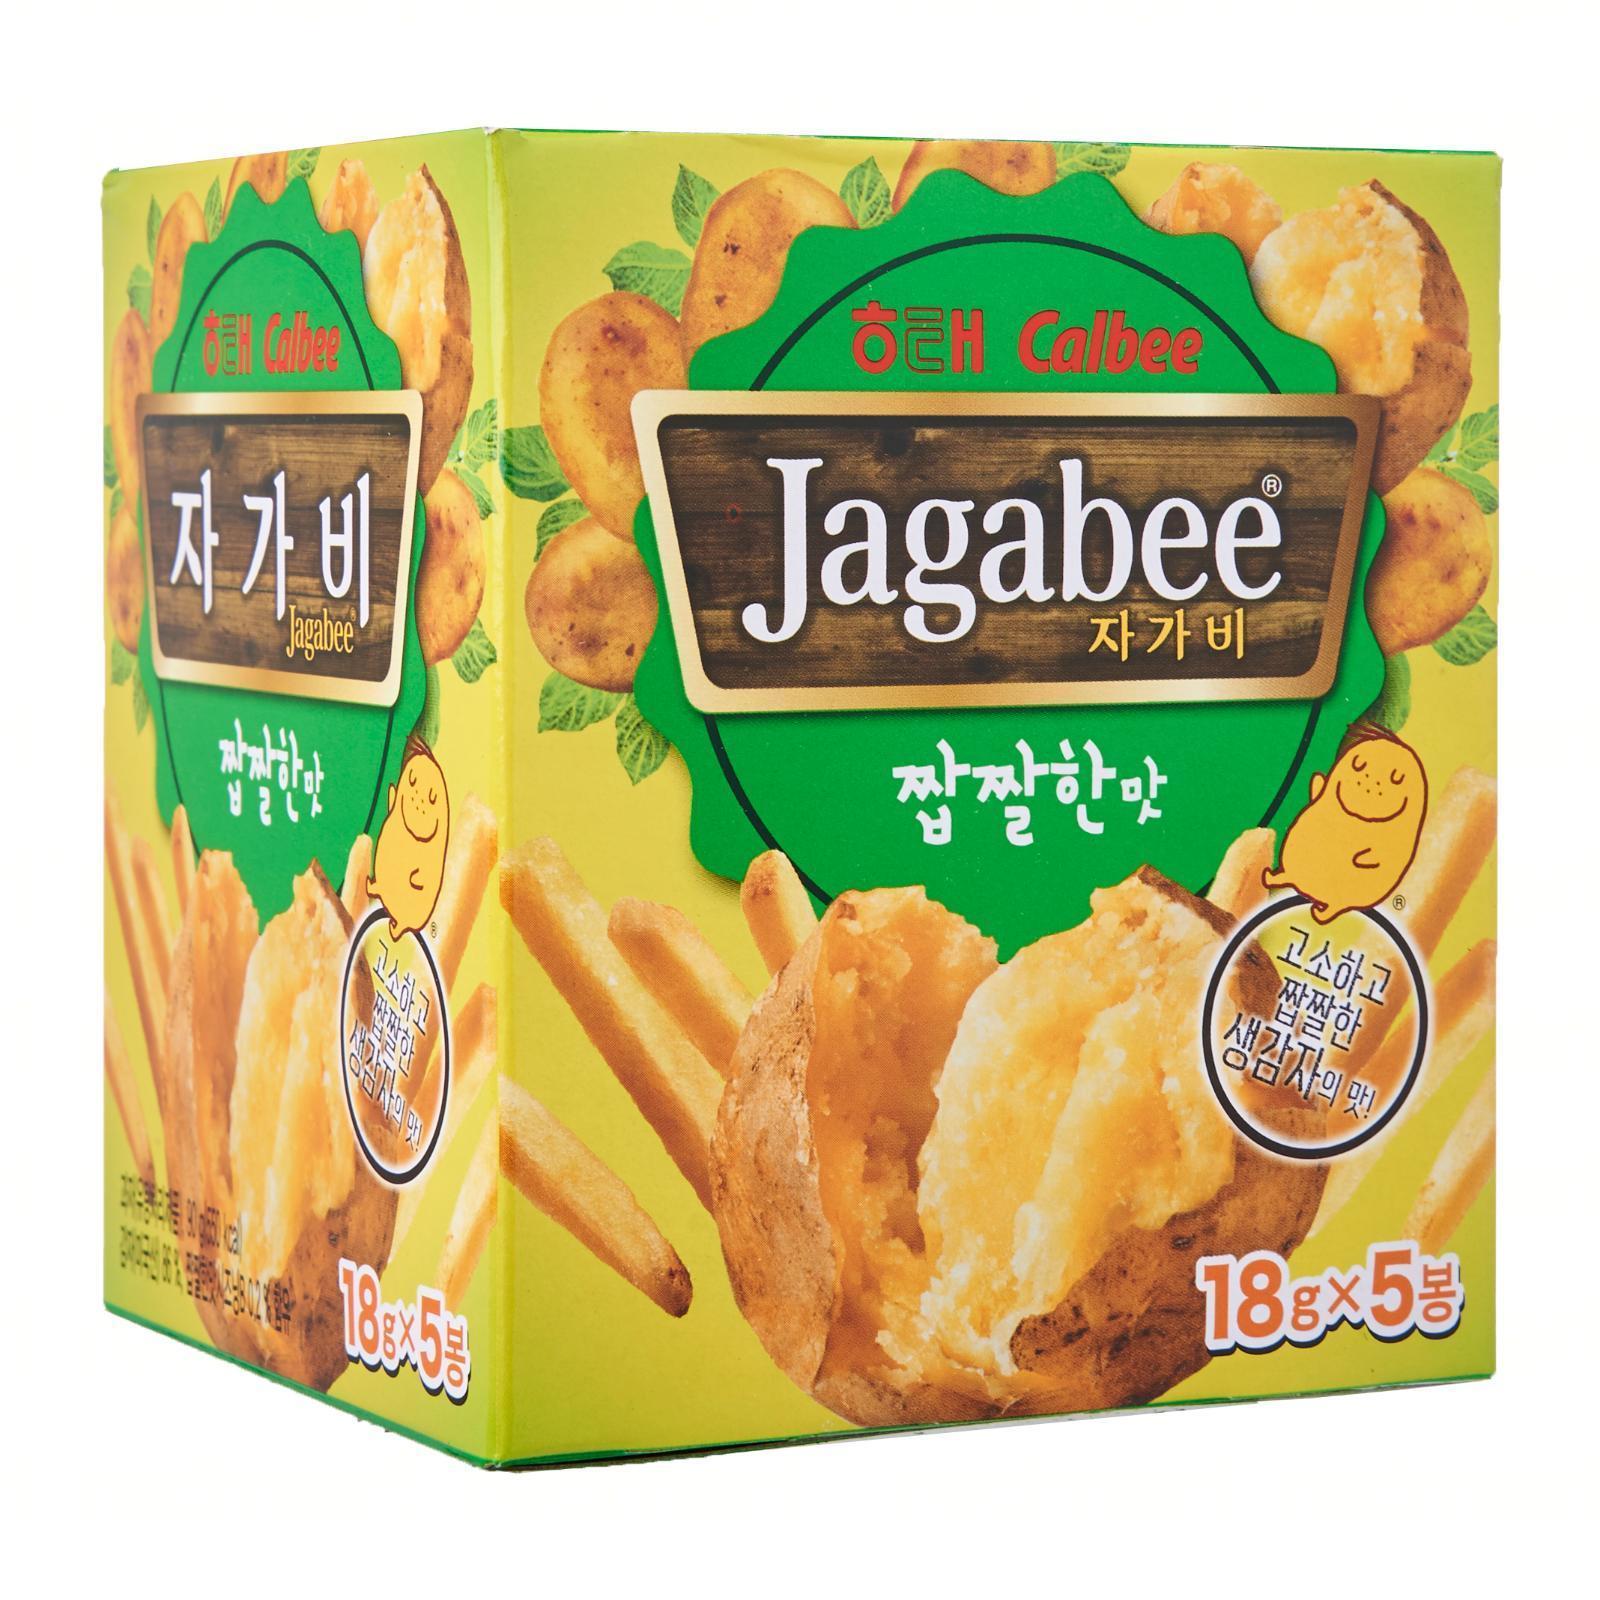 HaiTai X Calbee Korean Original Jagabee Potato Sticks